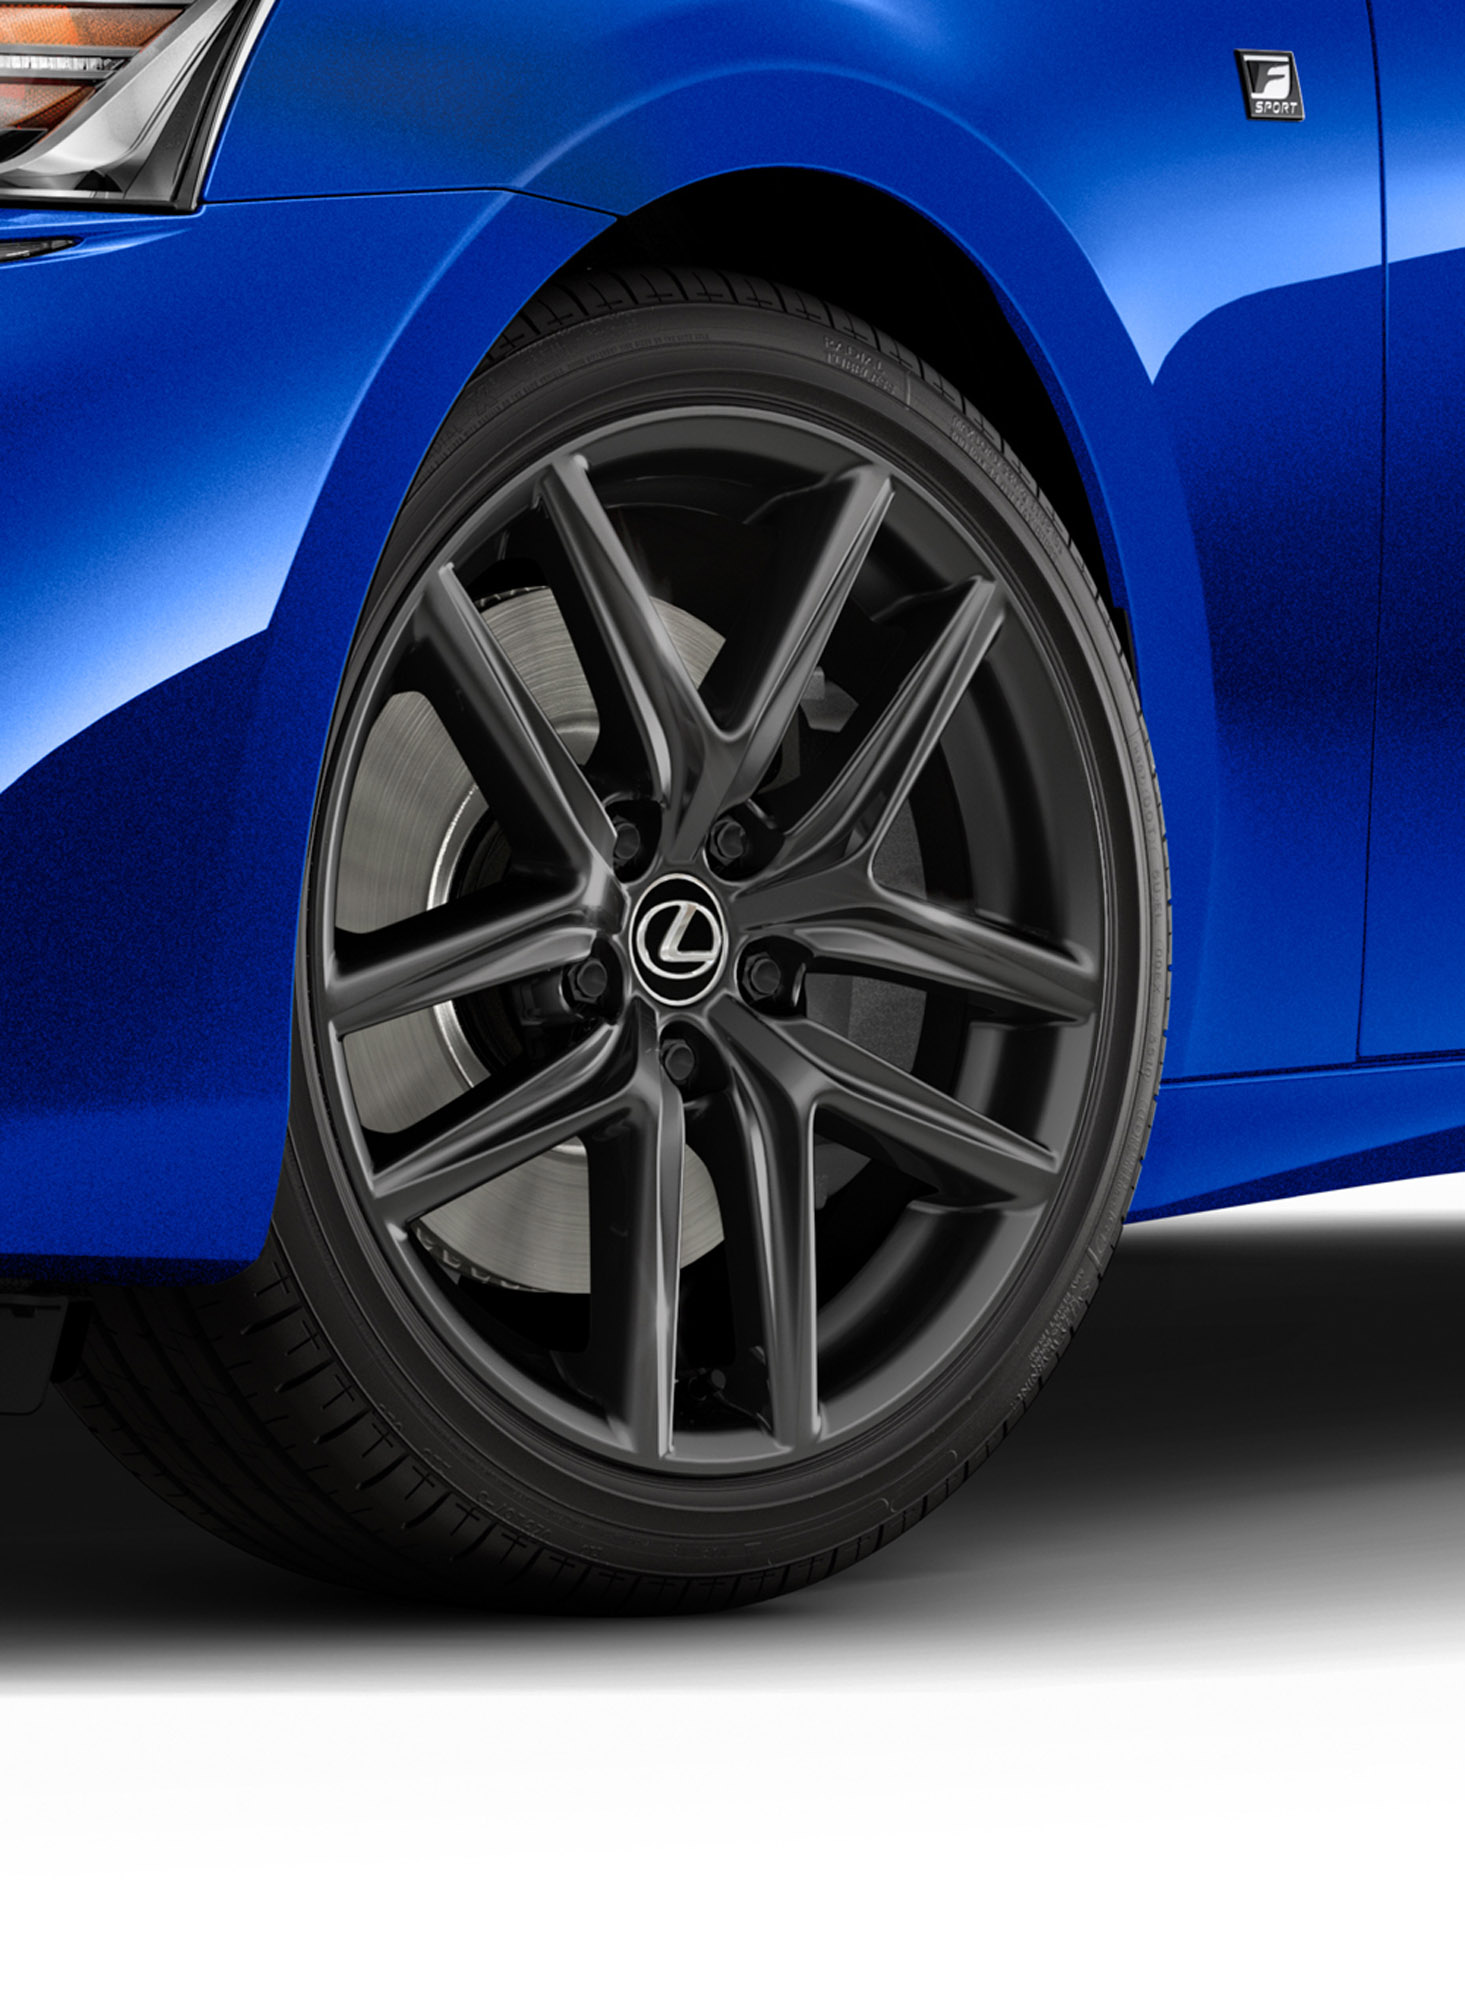 lexus reveals new 2020 is f sport blackline edition models  check  u0026 39 em out